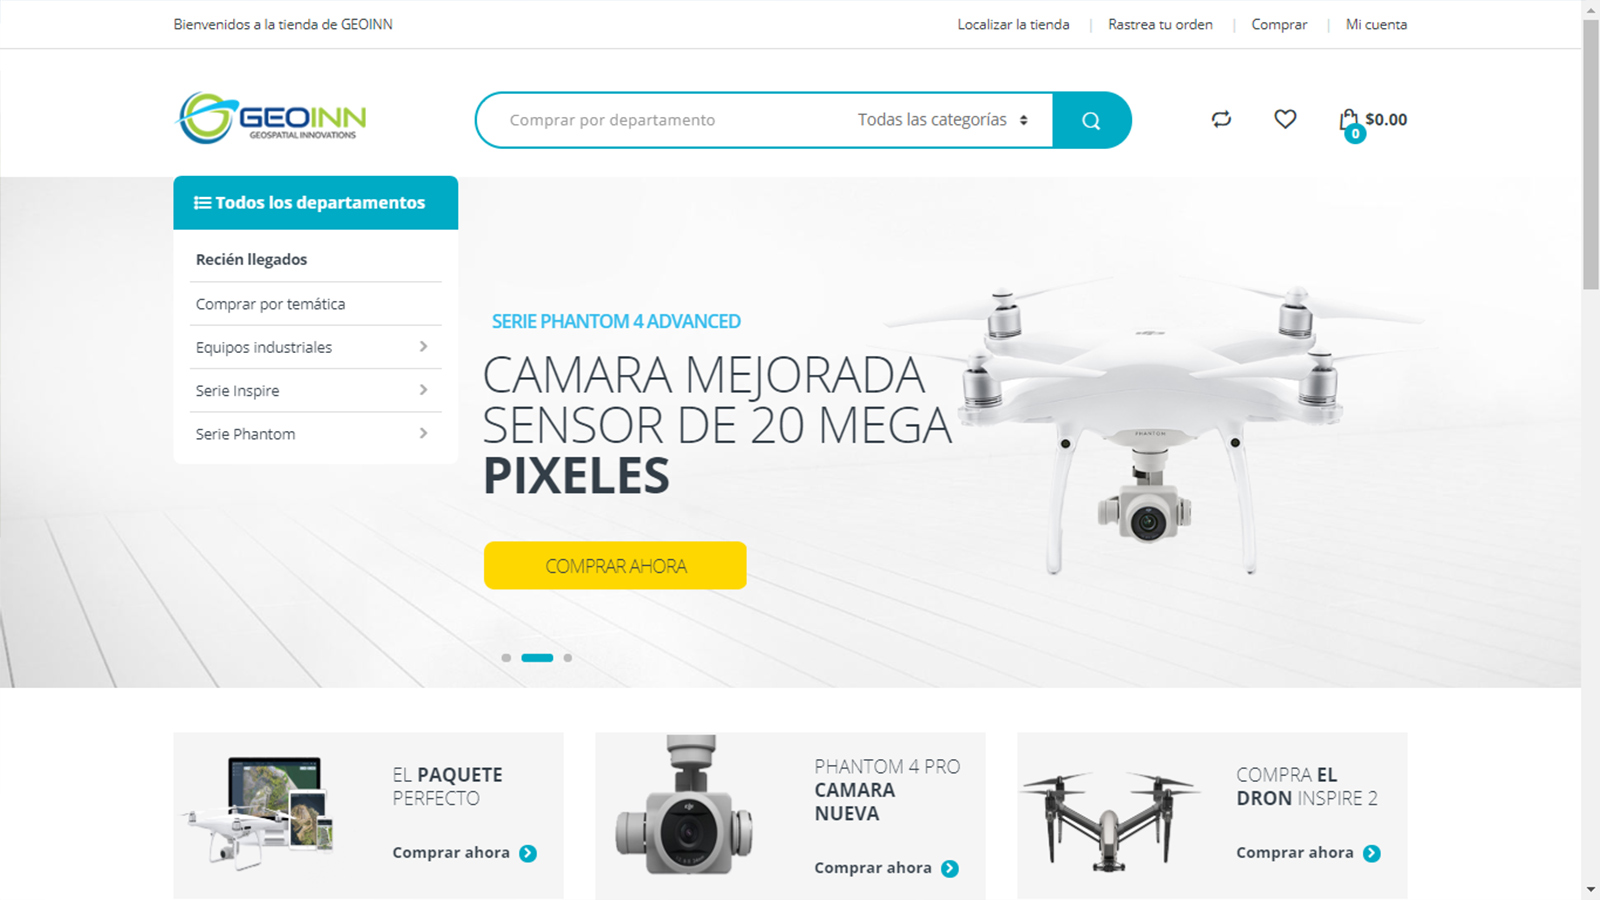 GeoInn Tienda De Drones *